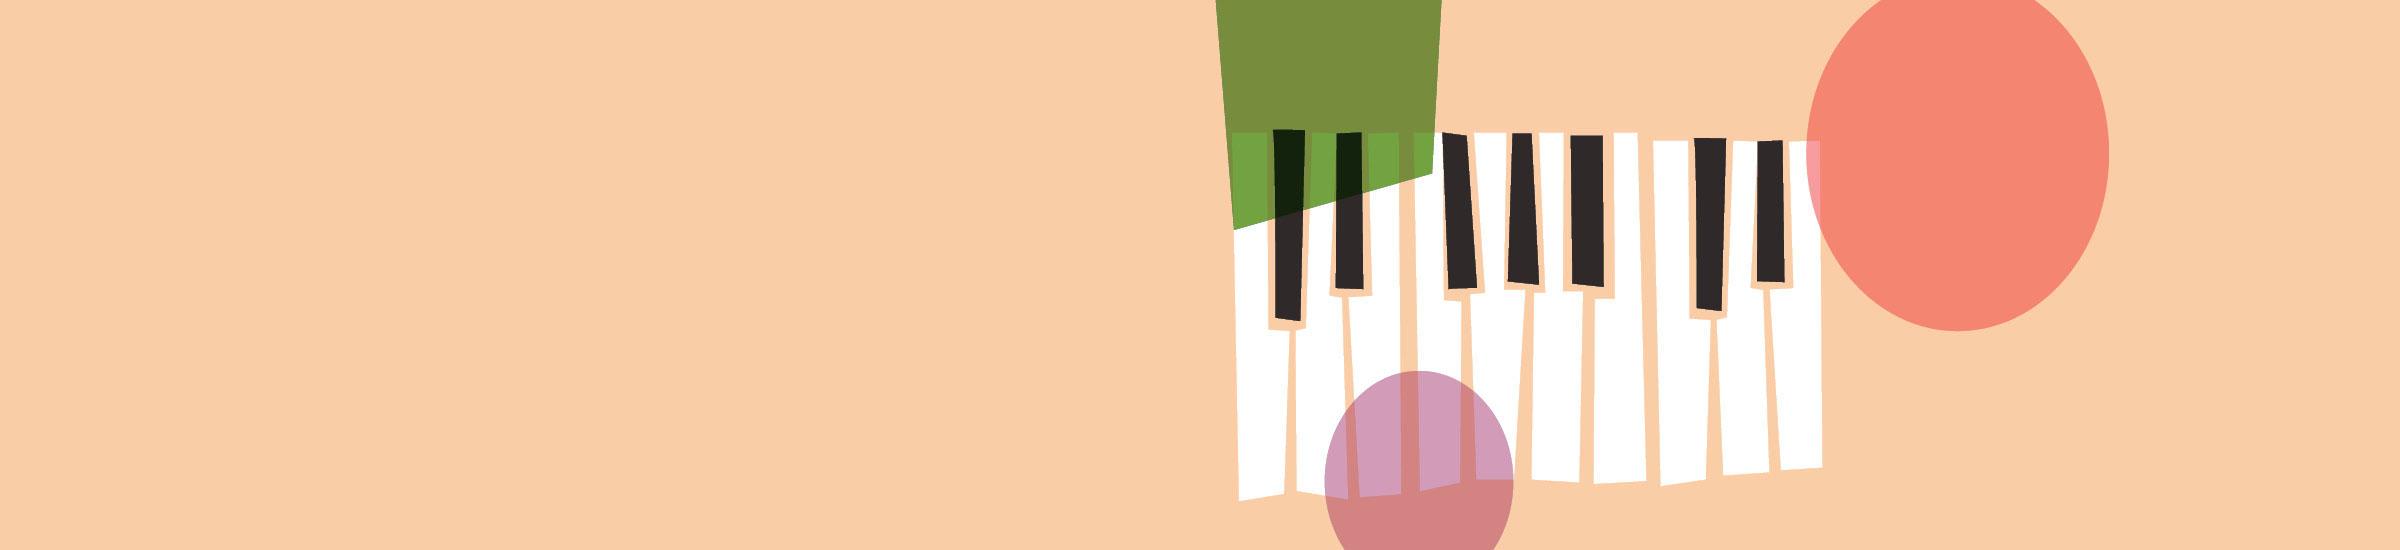 Gershwin's piano concerto